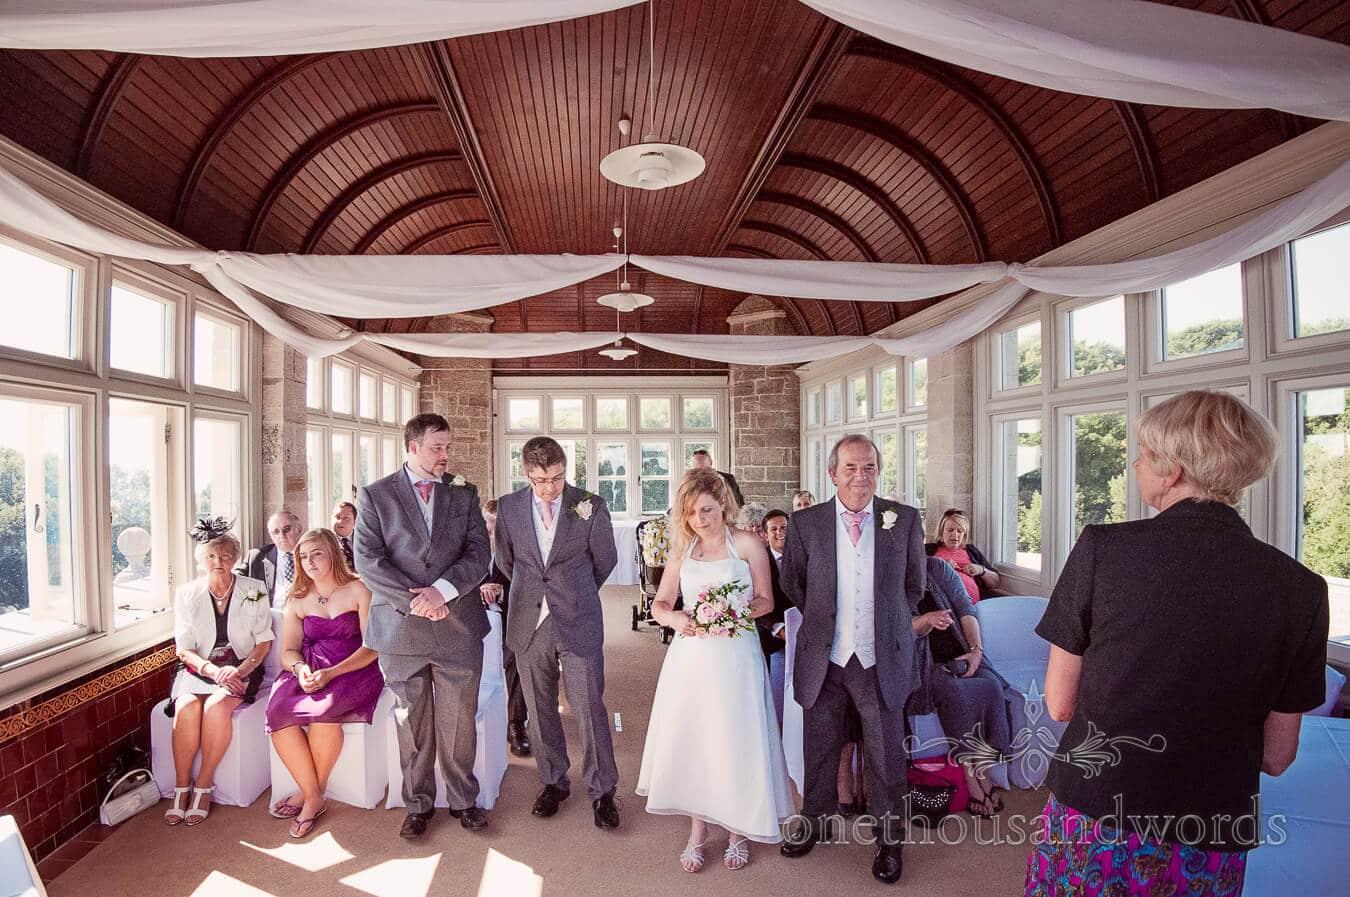 Civil wedding service at Vintage Style Wedding in Durlston Castle, Dorset